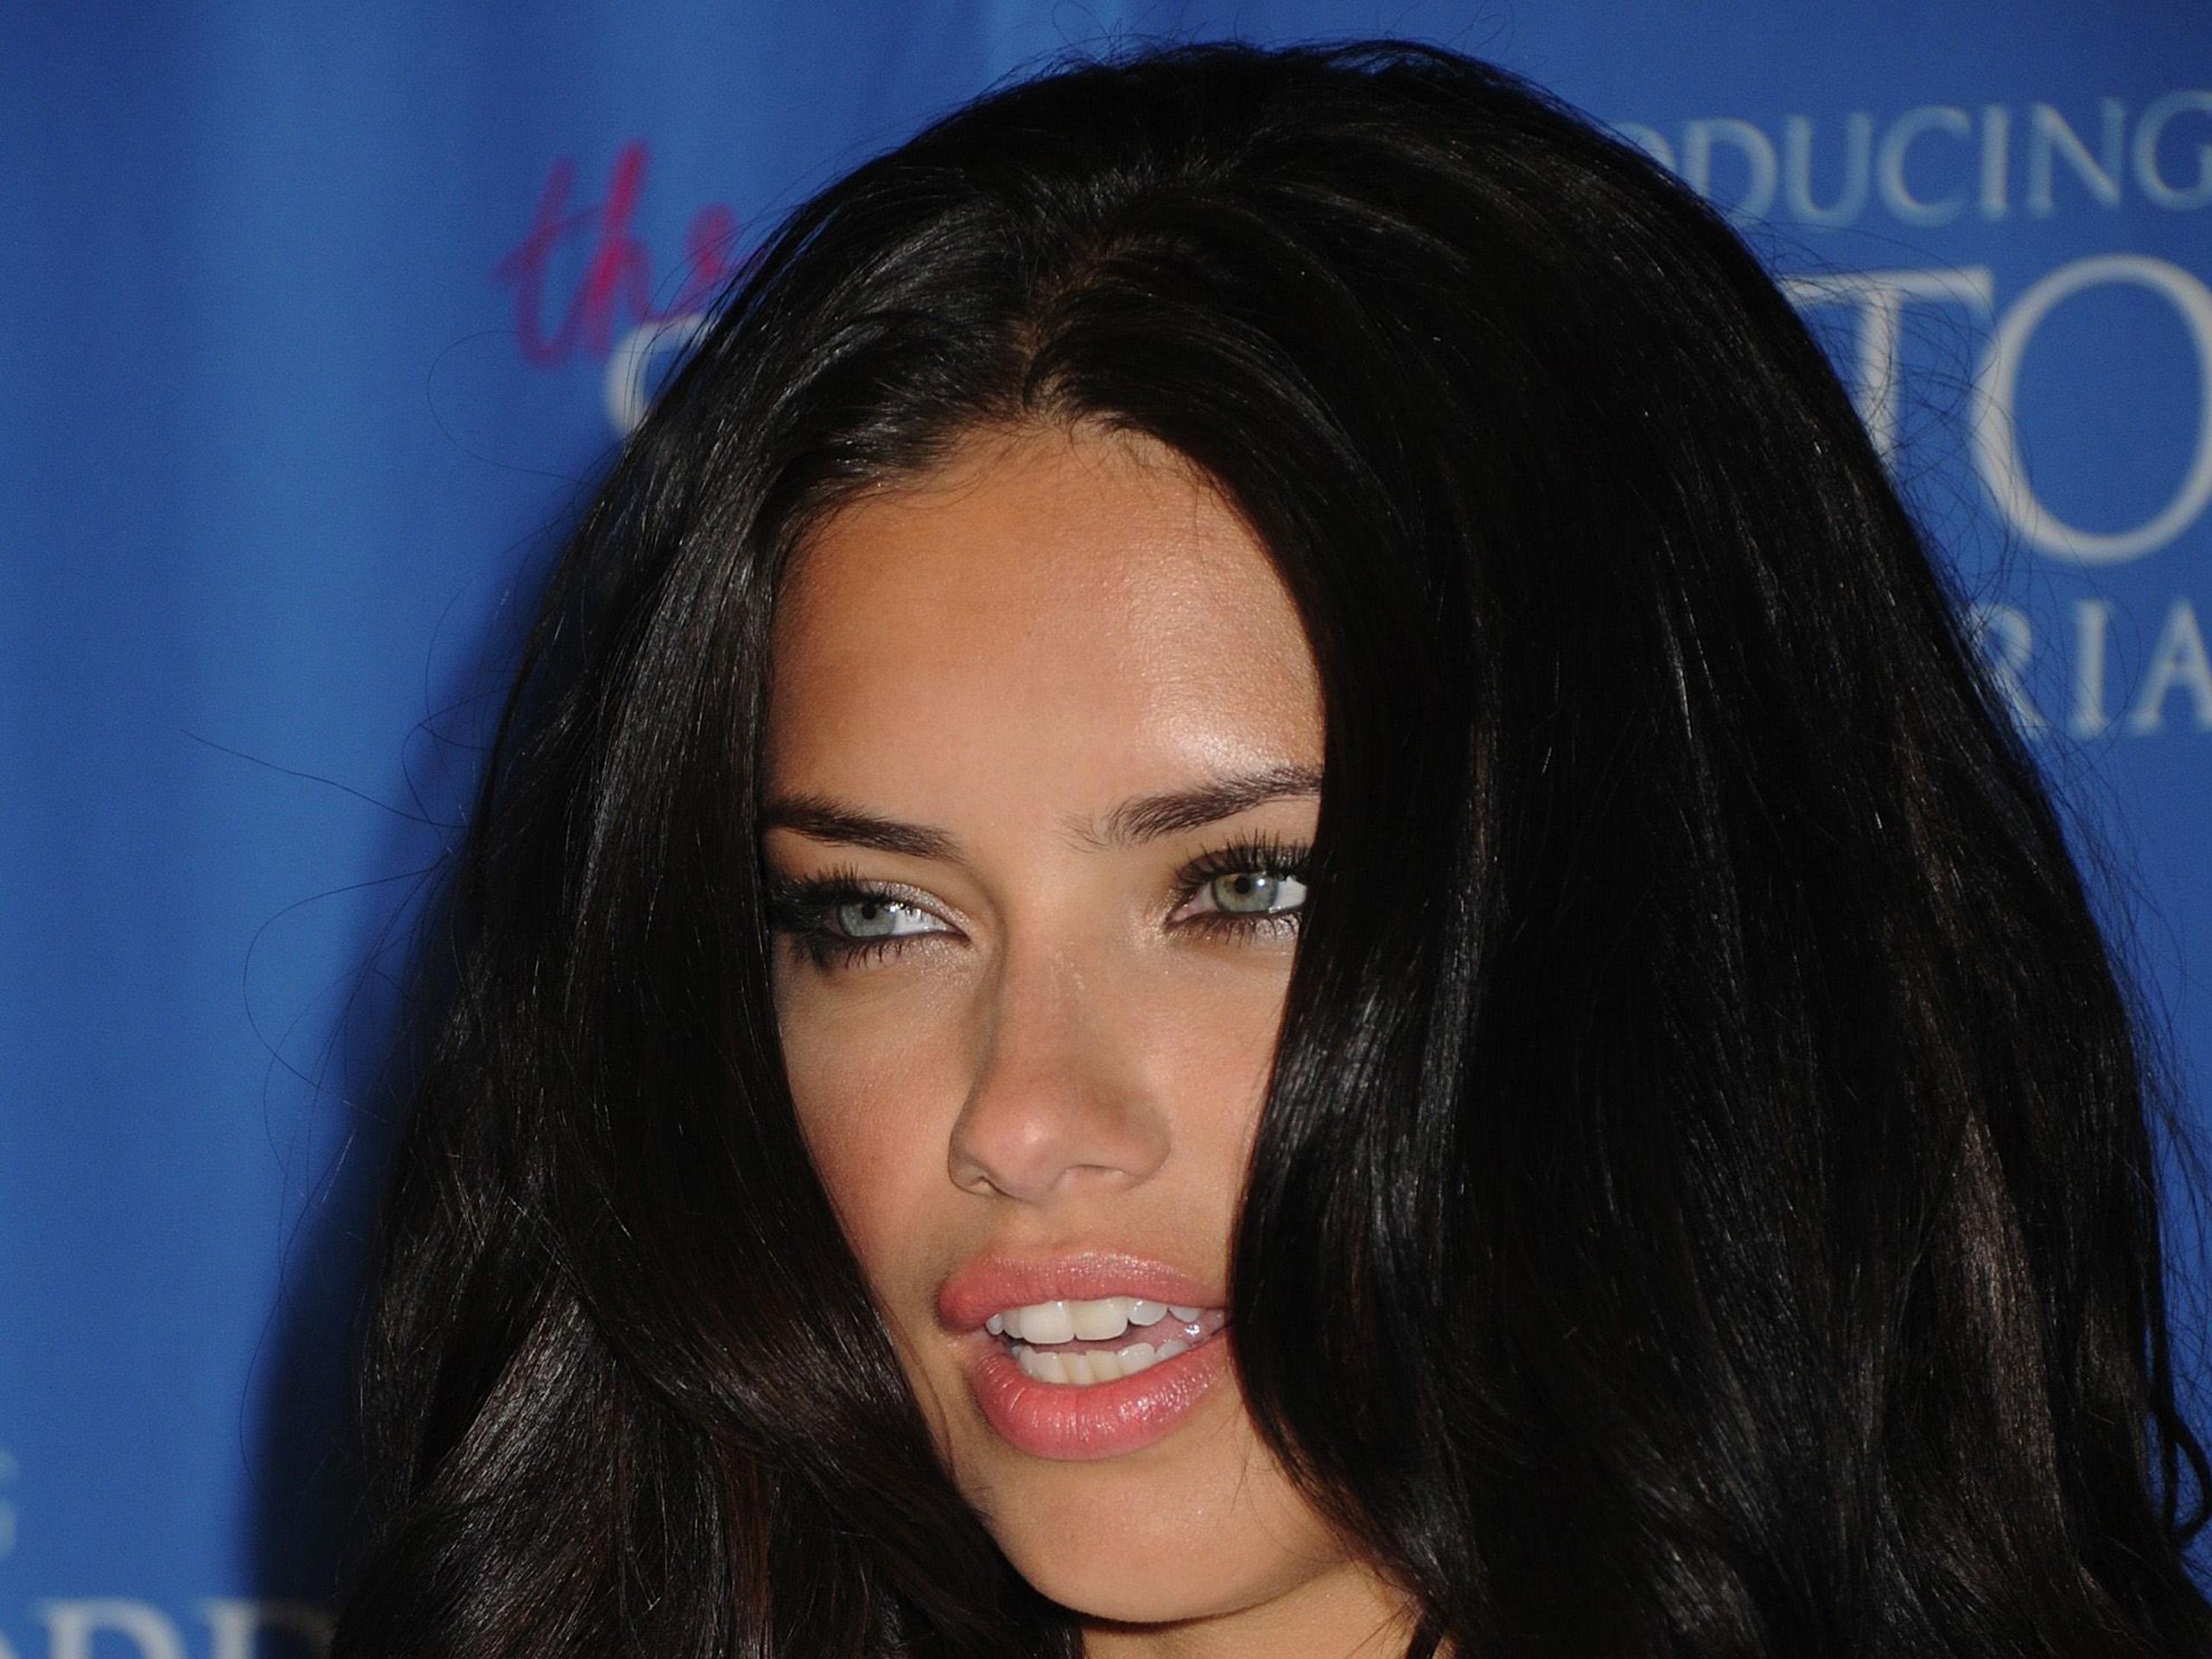 Adriana-Lima-Victorias-Secret-in-NYC-120